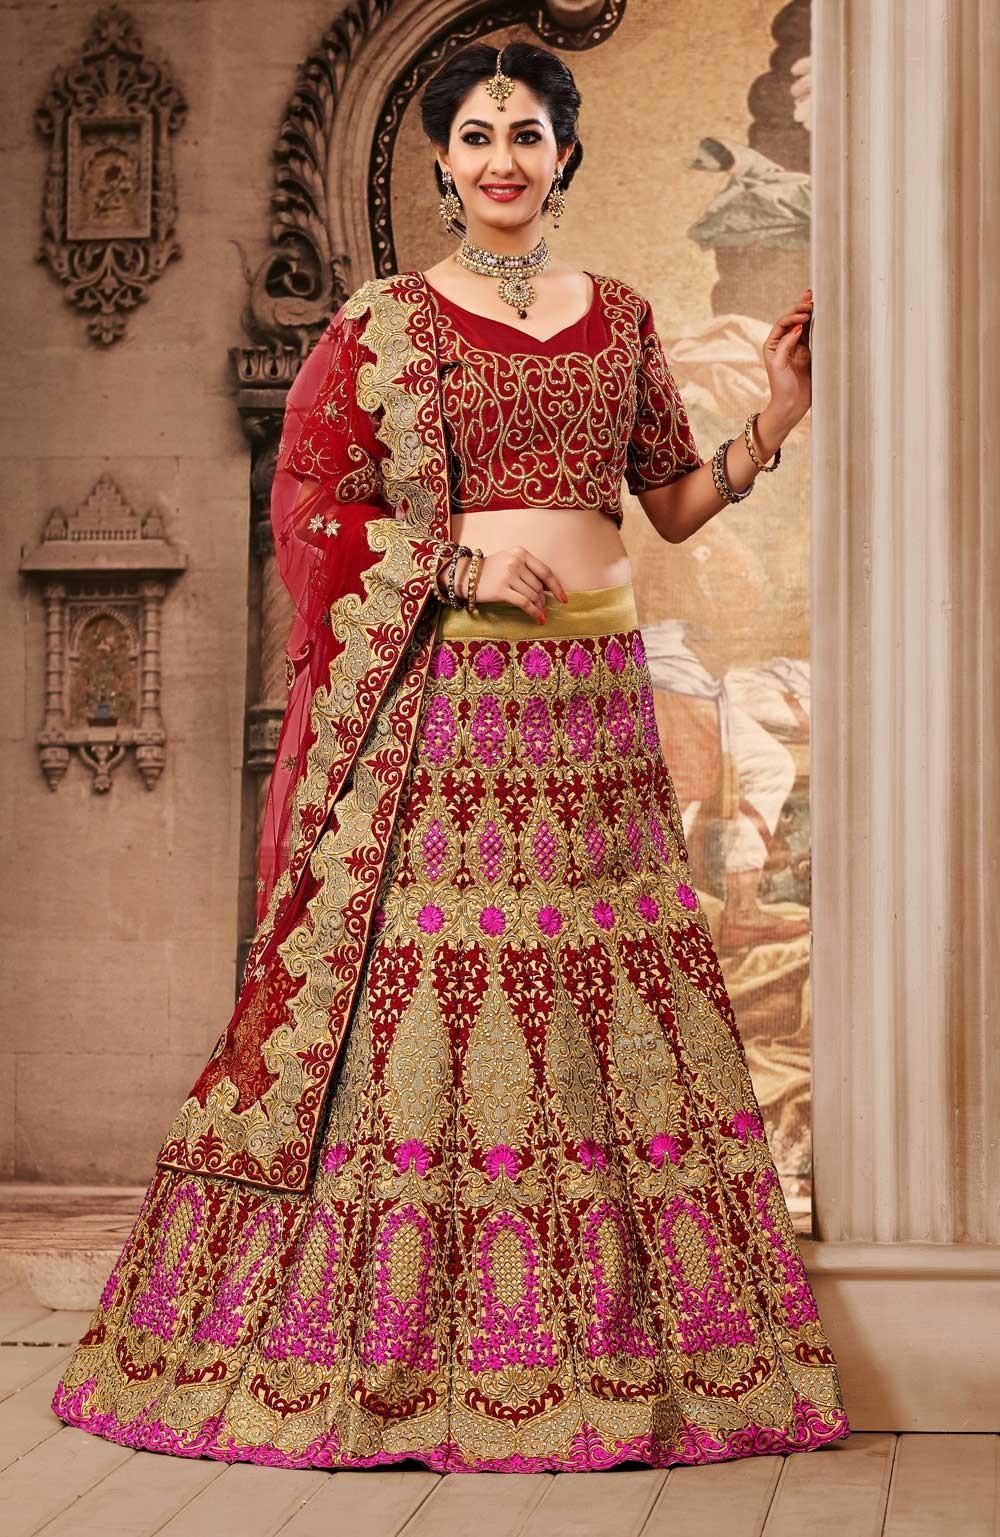 Famous Bollywood Fashion Designers